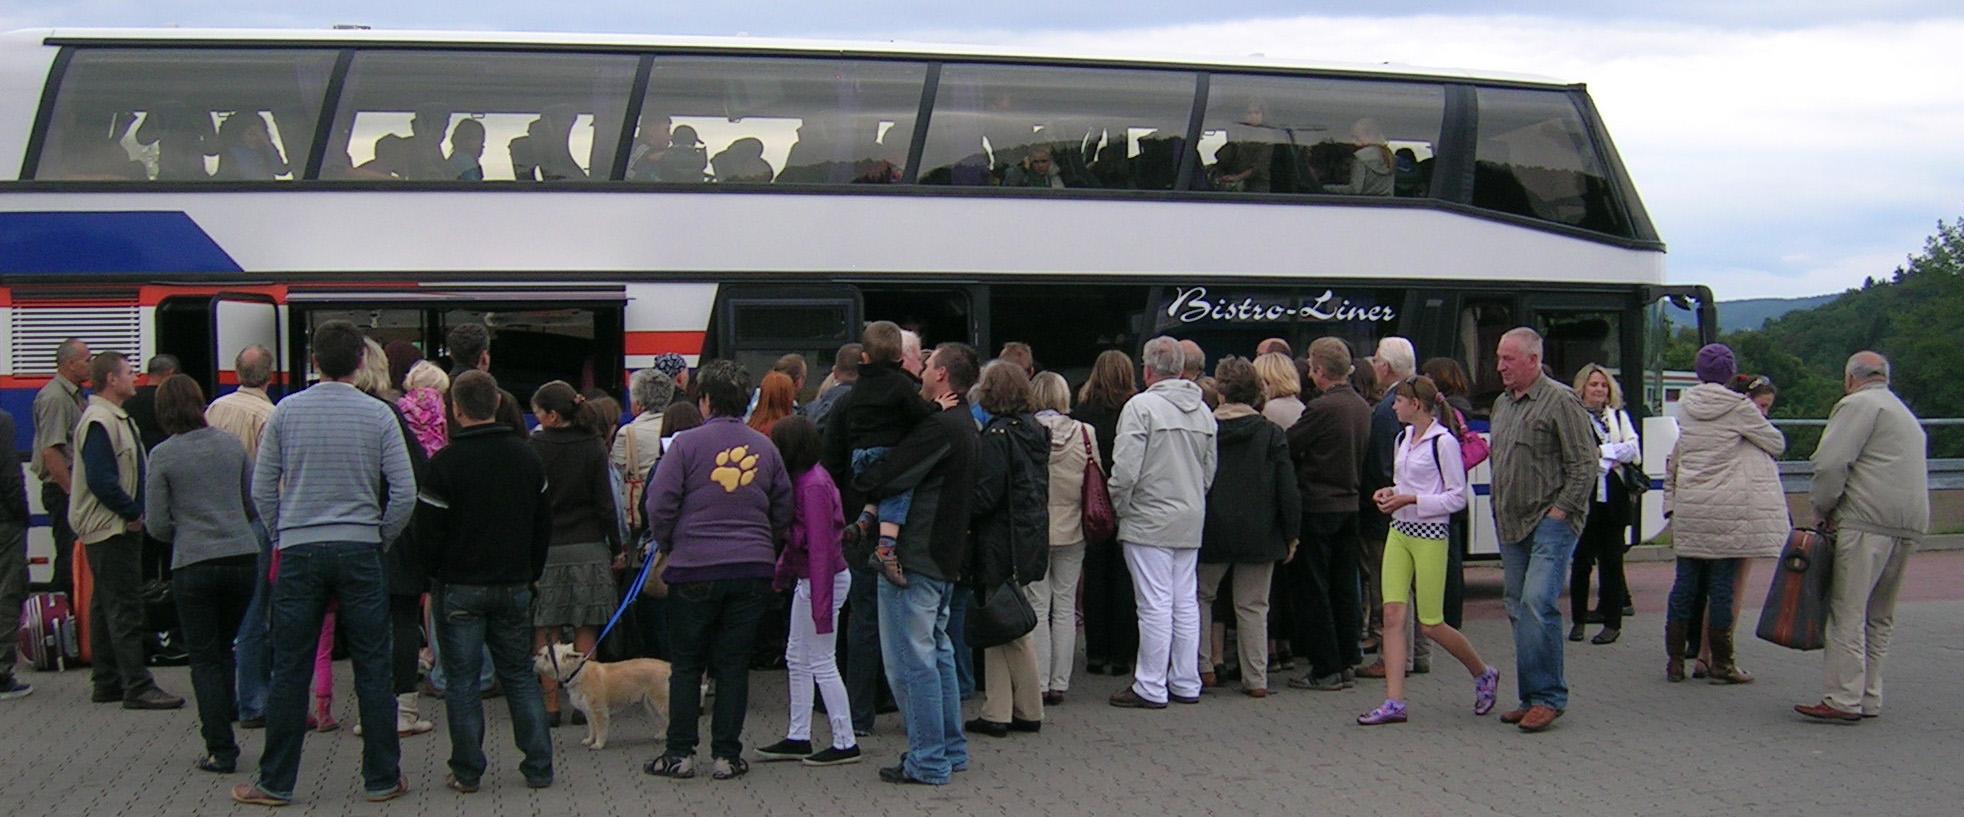 Kinderbus aus Wischgorod in Kierspe angekommen